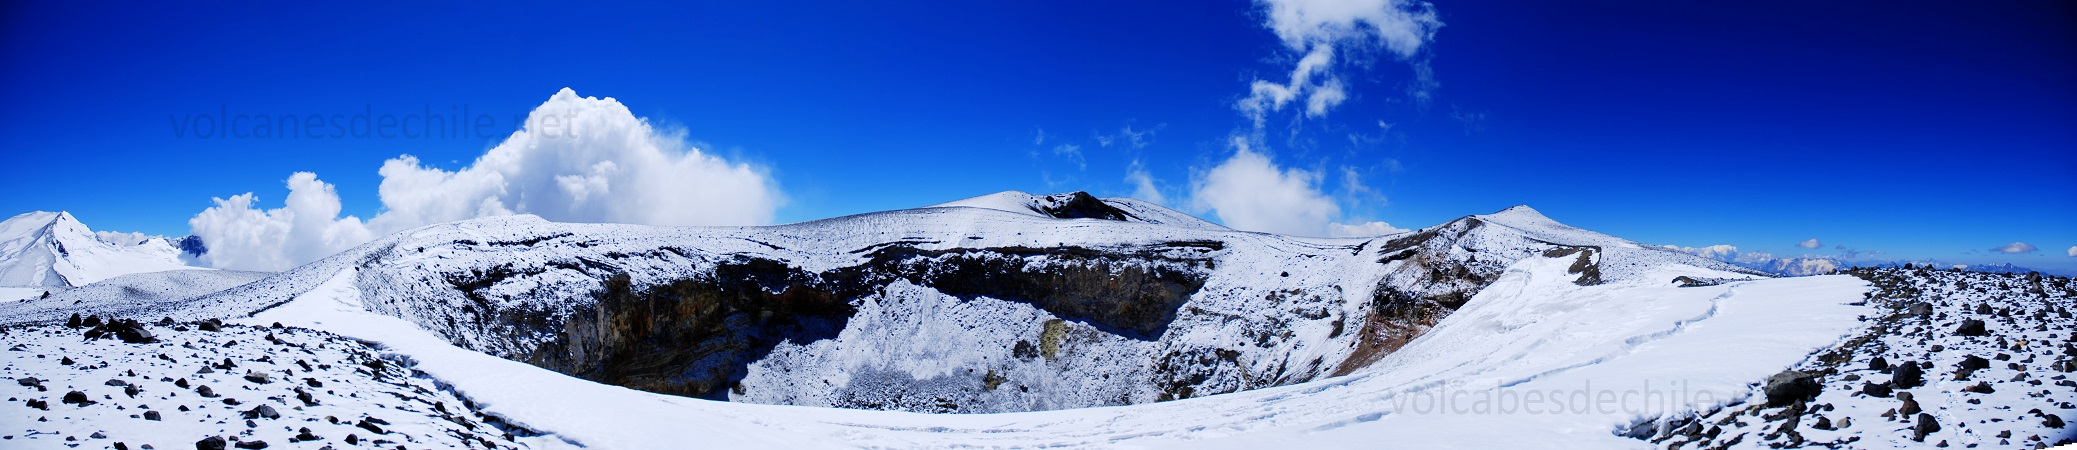 Cráter en Volcán San José